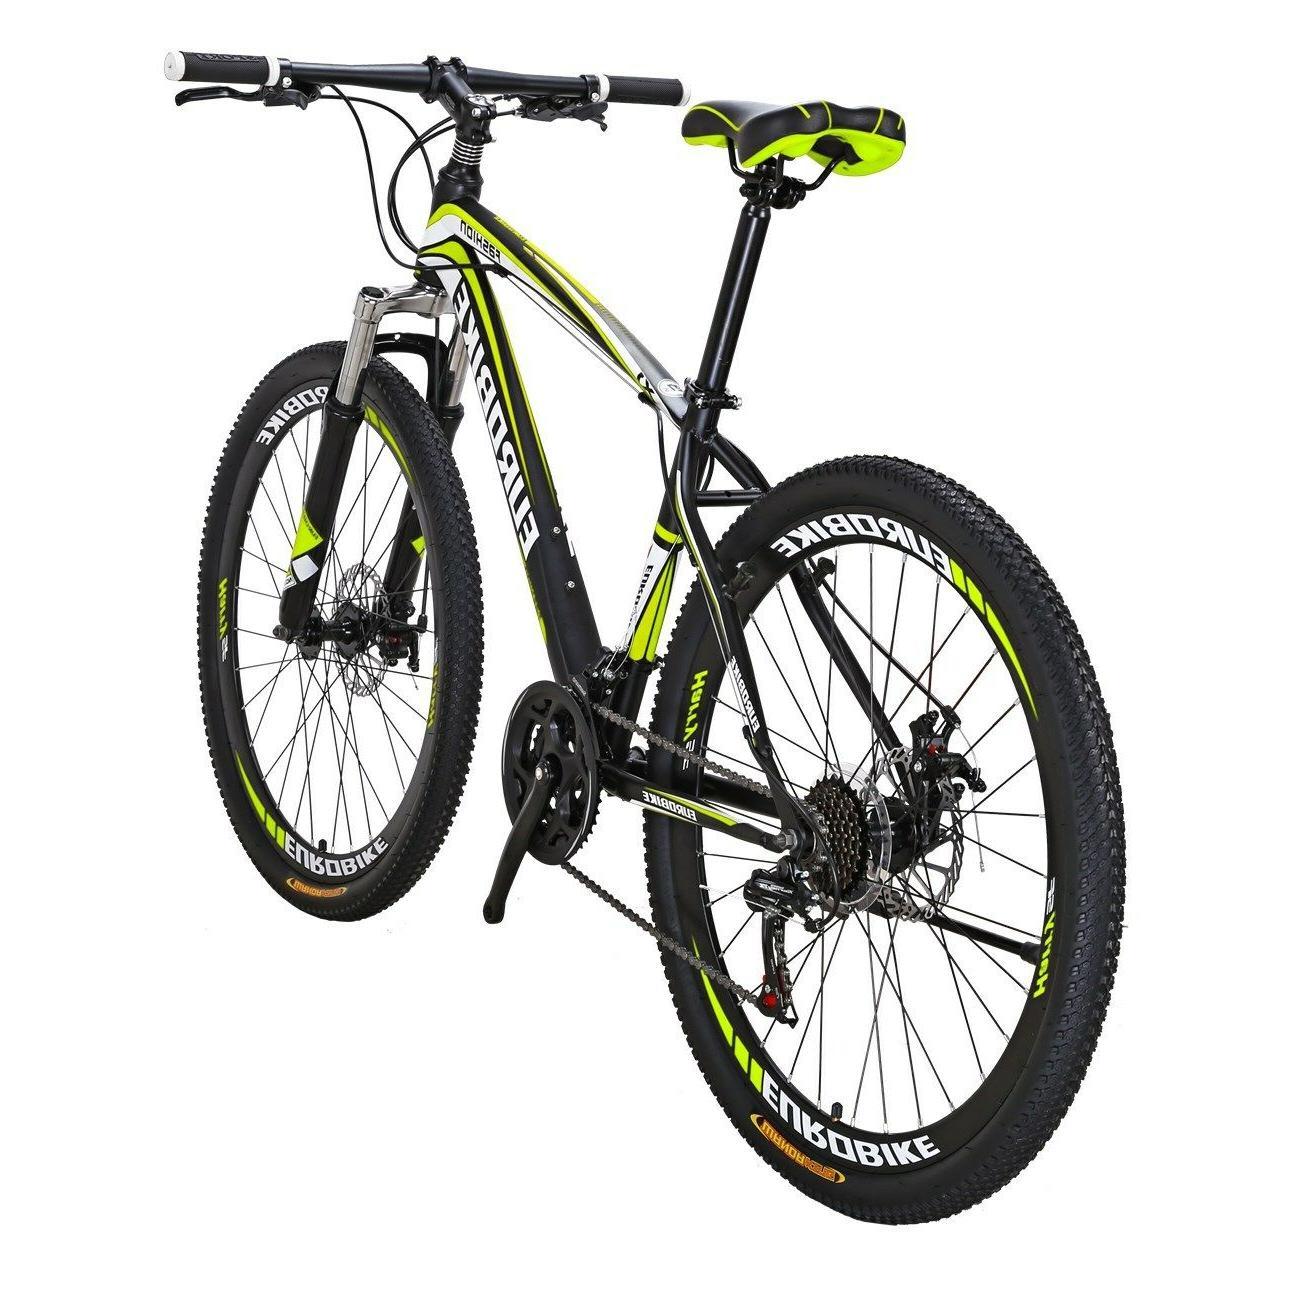 "Mountain Bike Front Shimano Speed Bikes 27.5"" bicycle L"